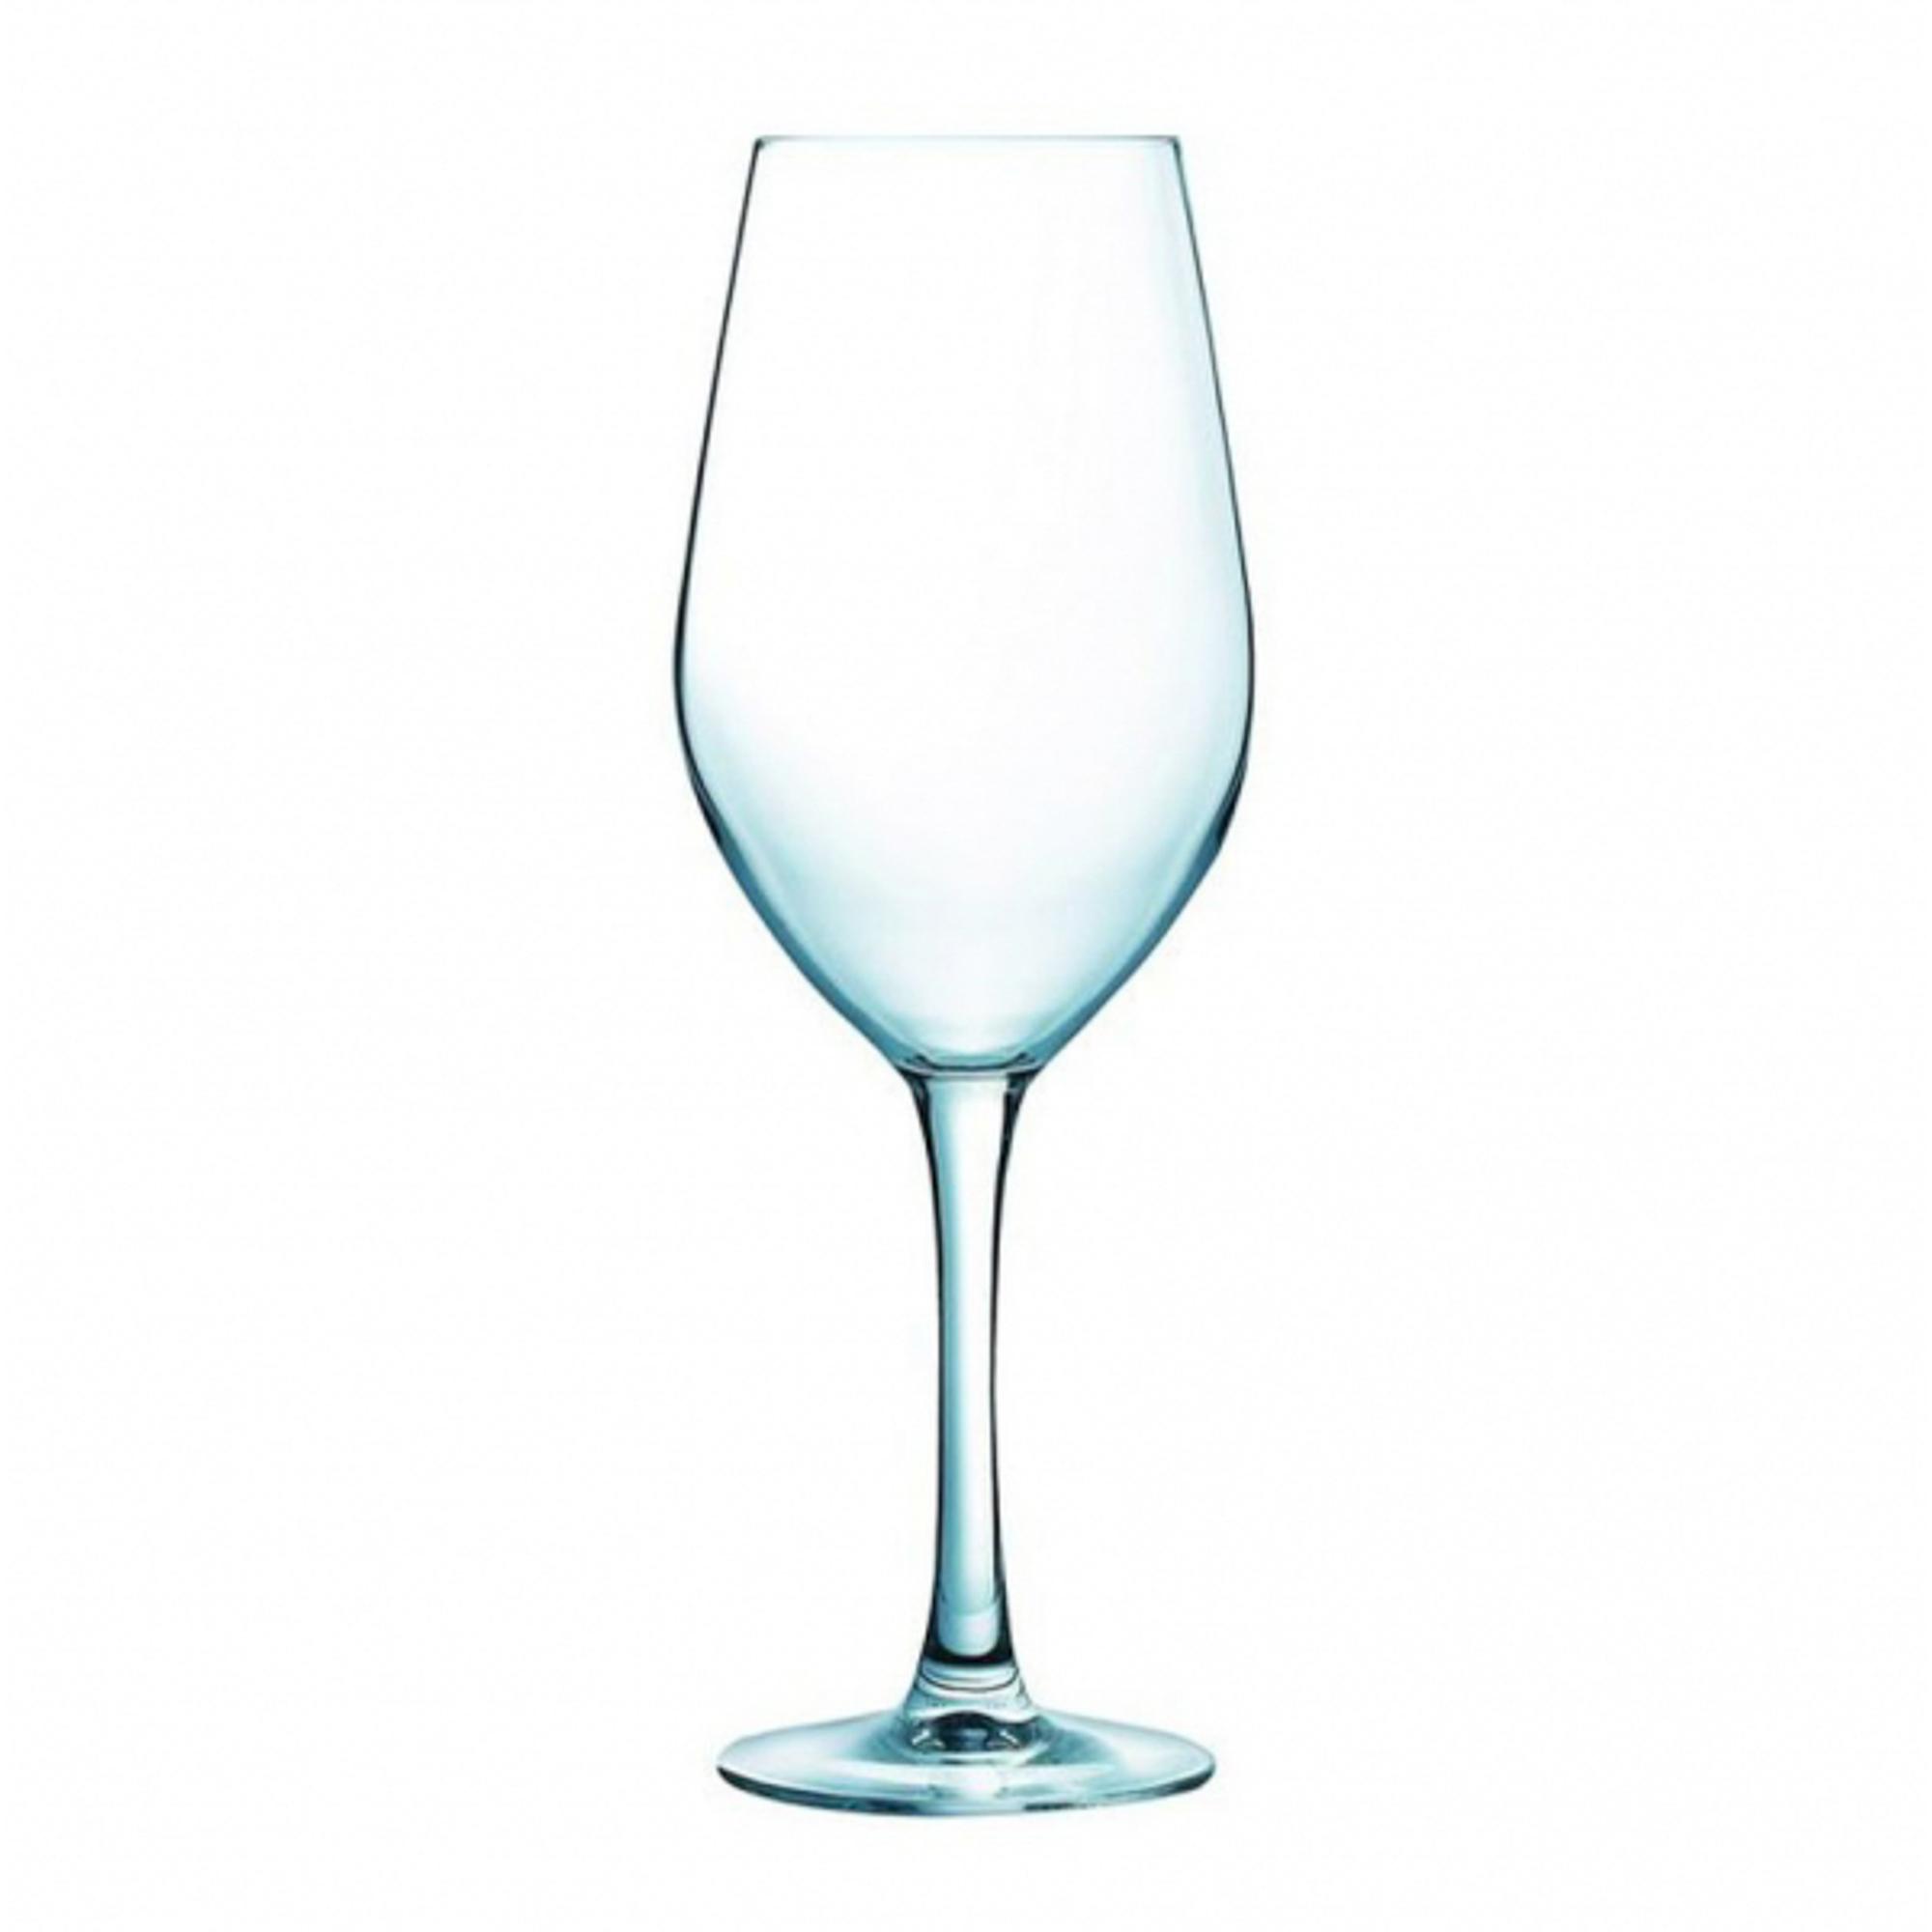 Фото - Набор бокалов для вина Luminarc селест 580мл 6шт набор бокалов для вина luminarc версаль 6шт 275мл g1509